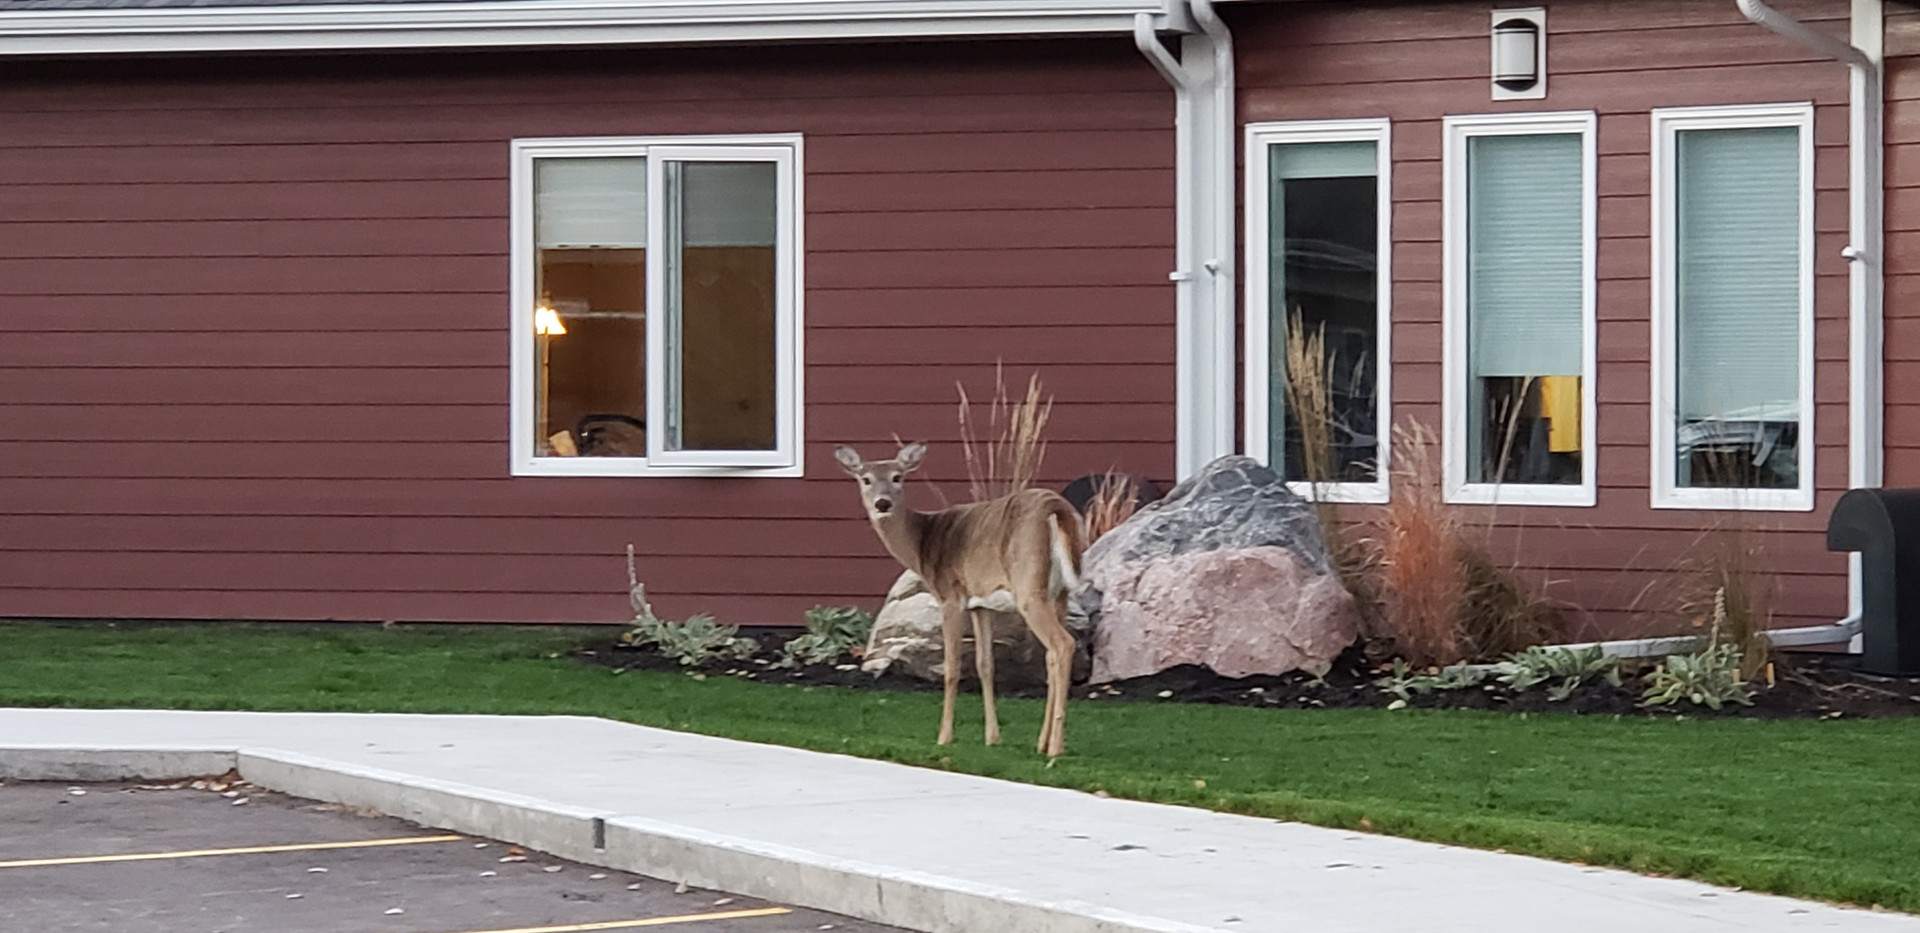 Ironwood Deer in front of home.jpg